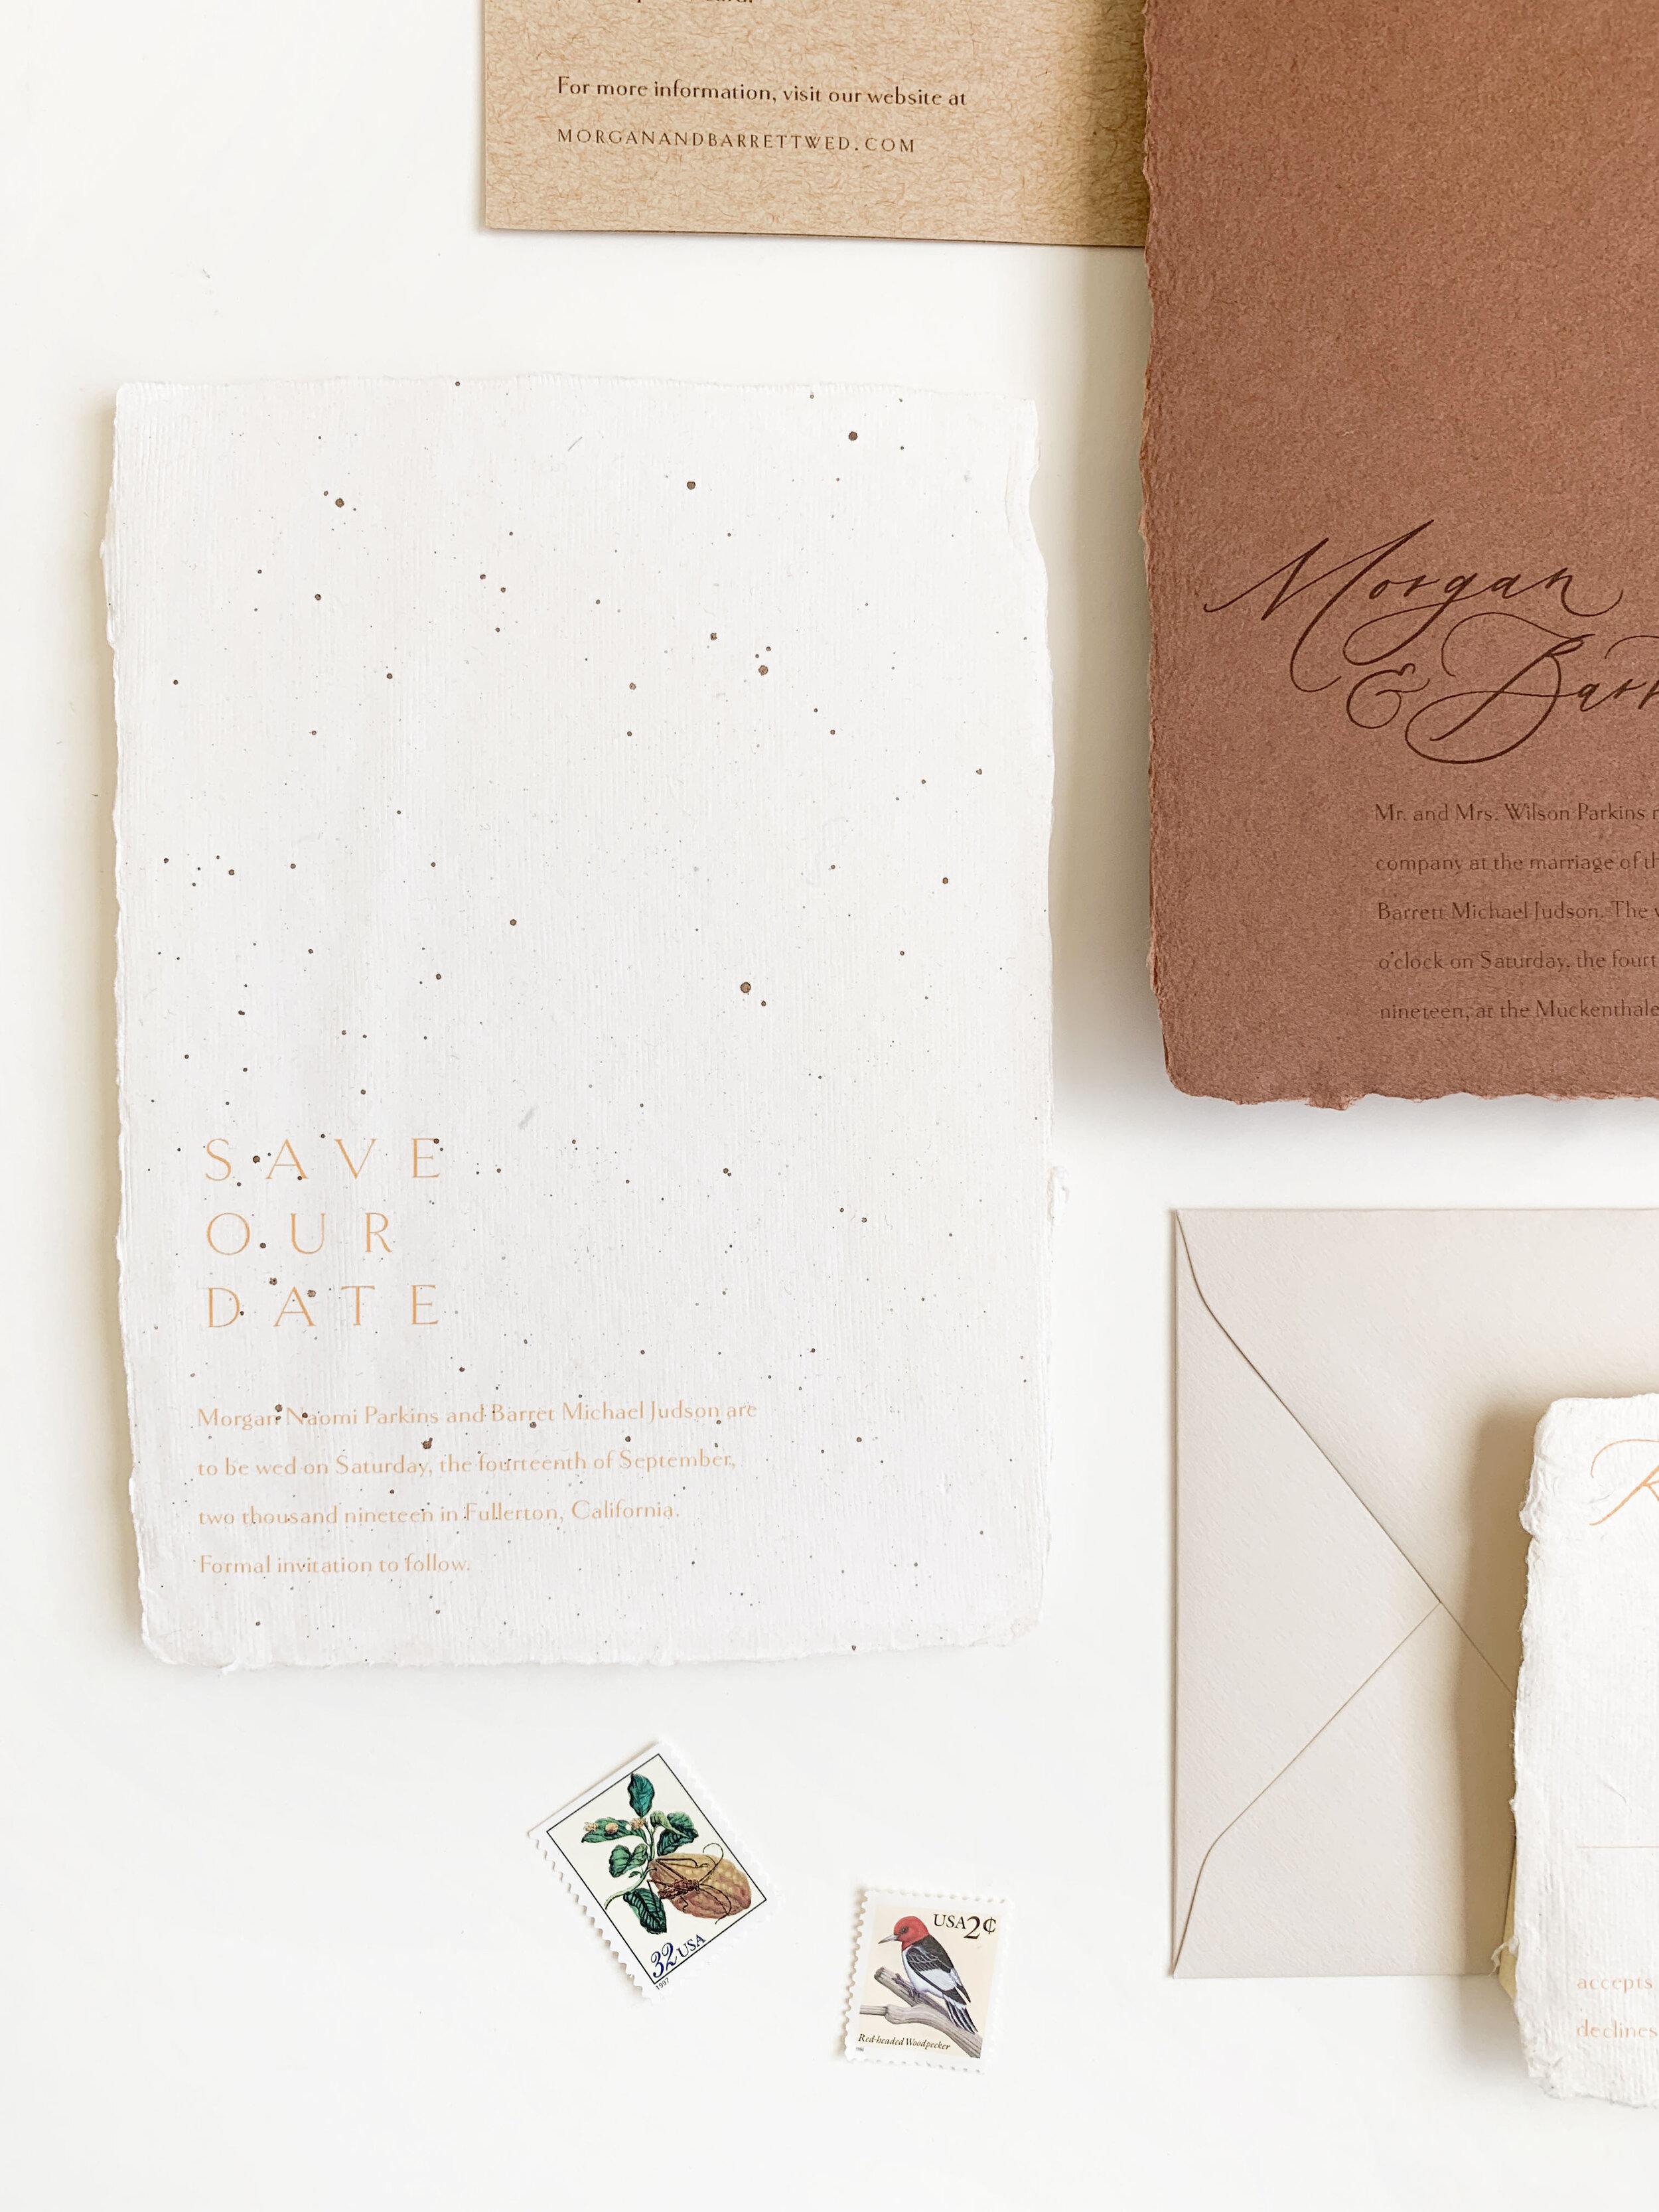 Modern wedding invitations on handmade paper. Terra cotta wedding invitations. Speckled paper wedding invitations. Calligraphy minimalist wedding invitations with vintage postage and calligraphy addressing.